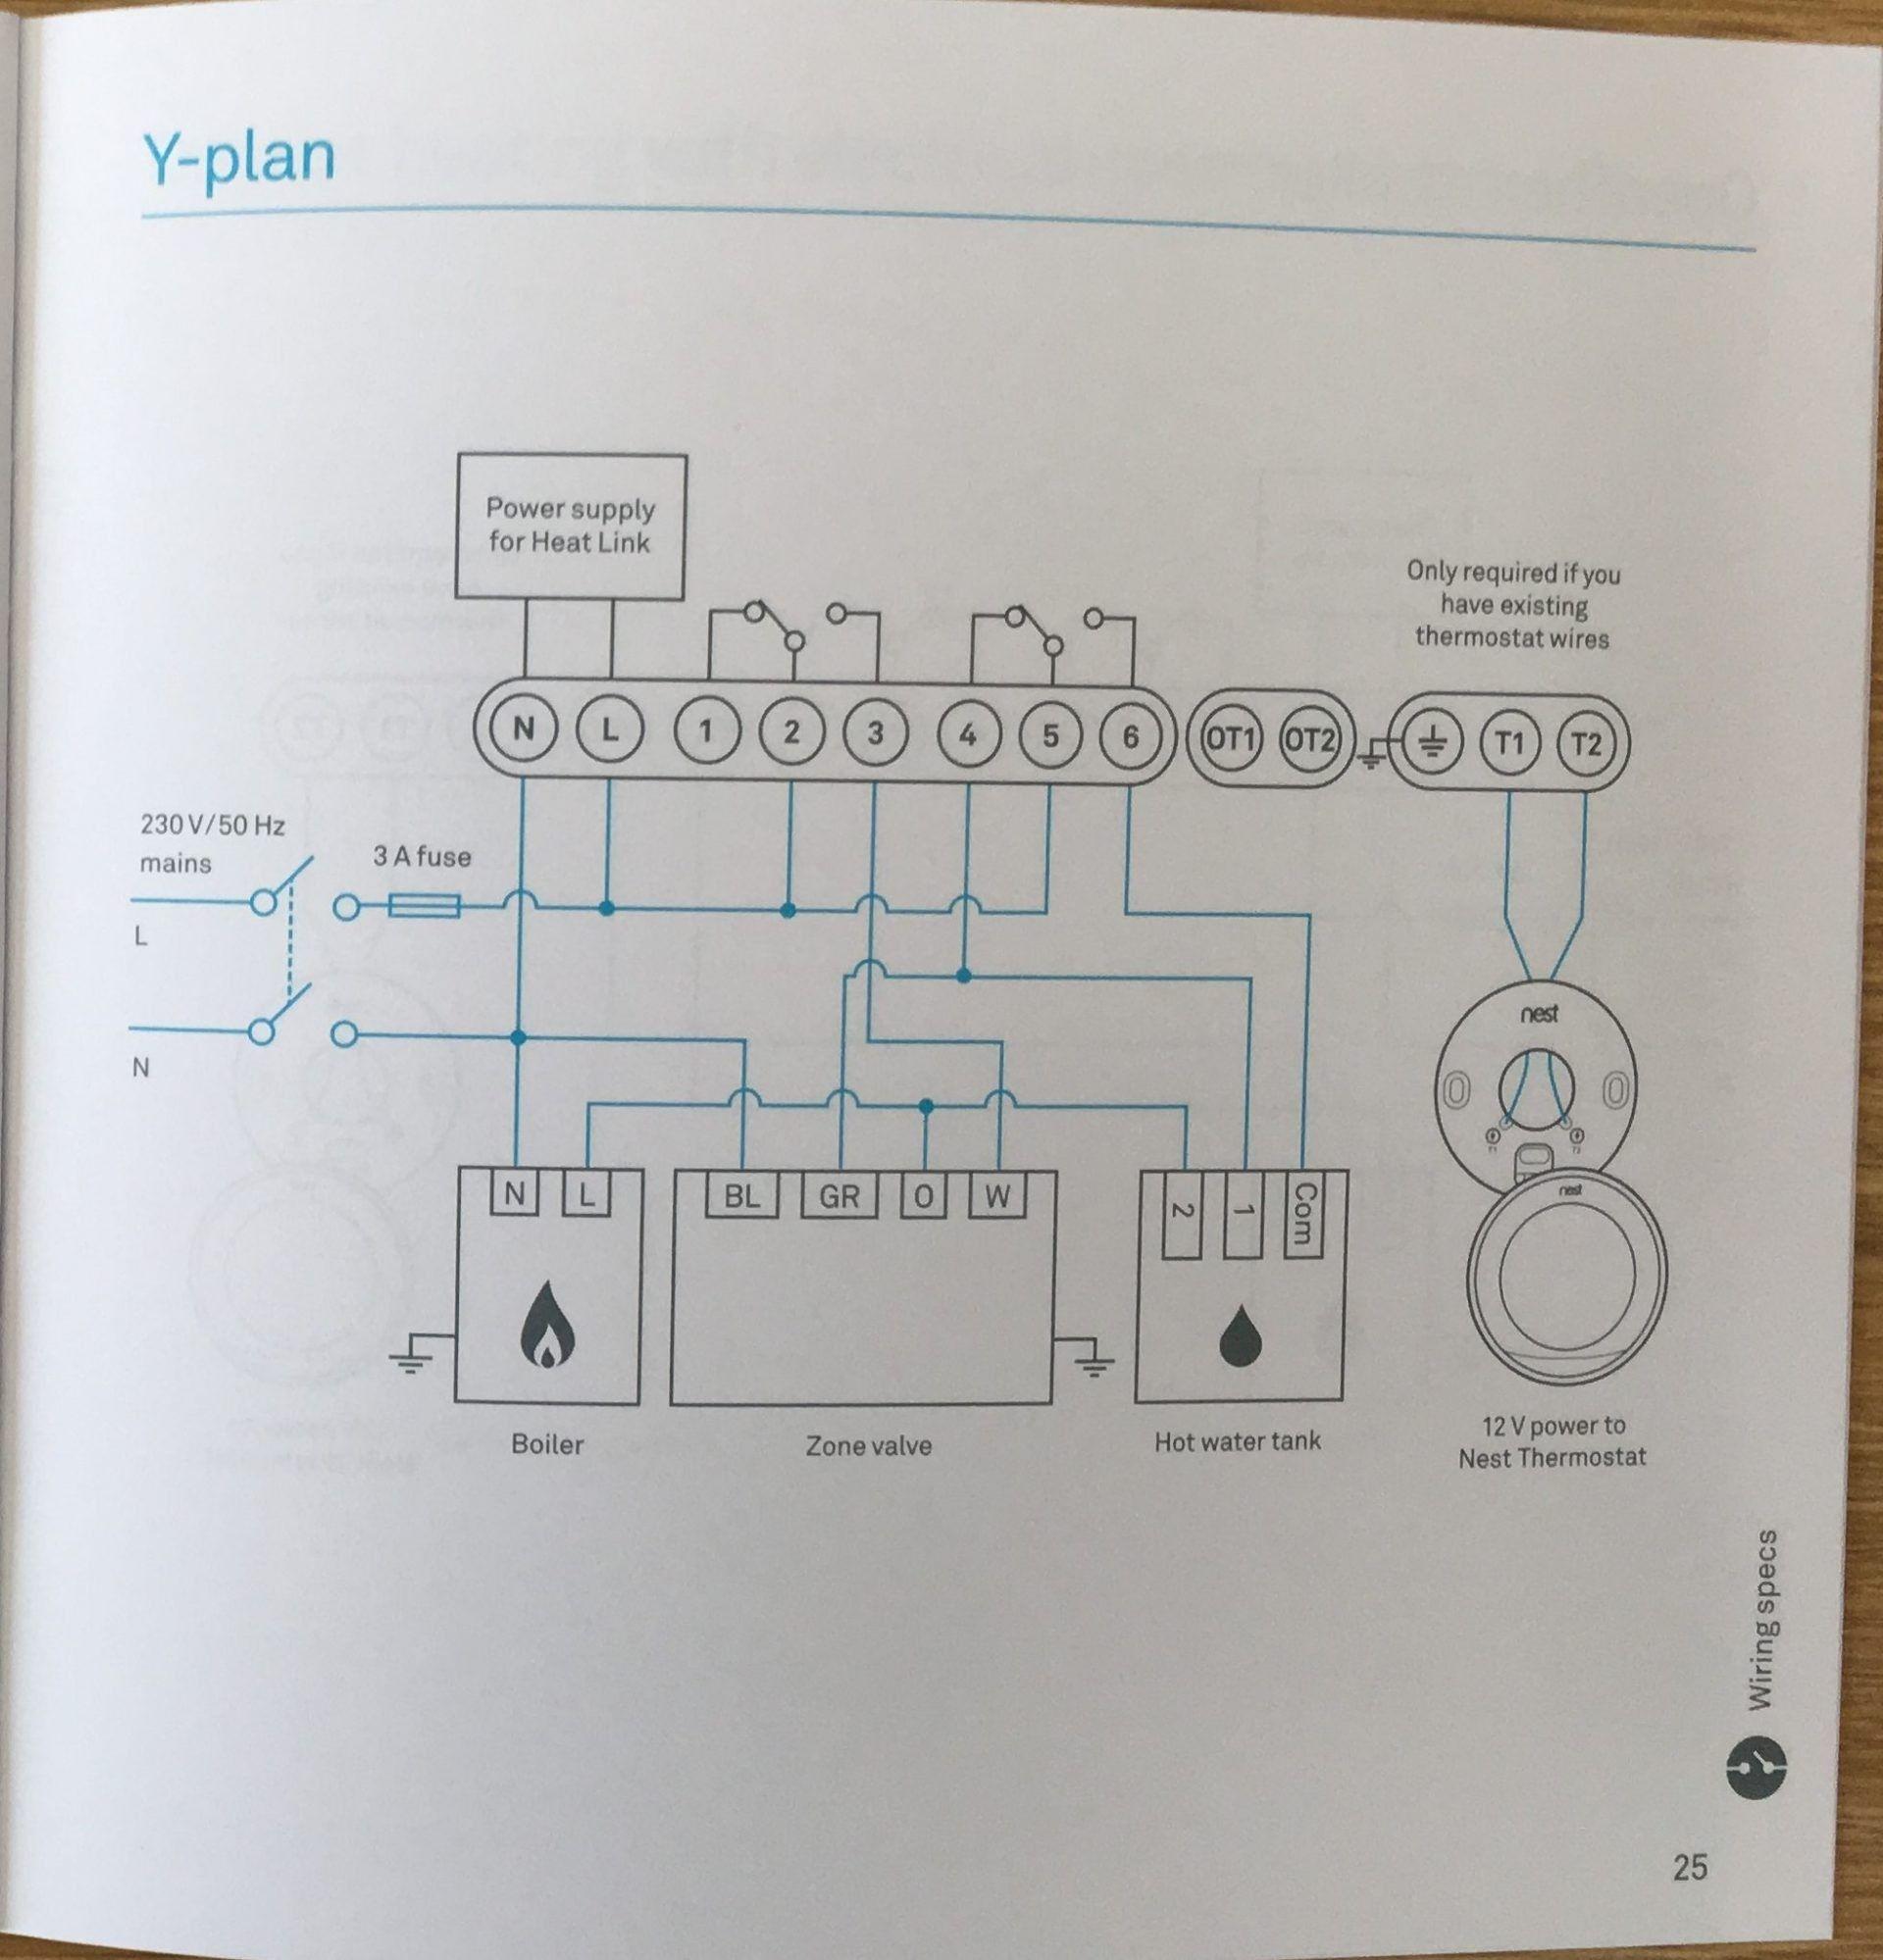 Unique Combi Boiler Programmer Wiring Diagram diagram